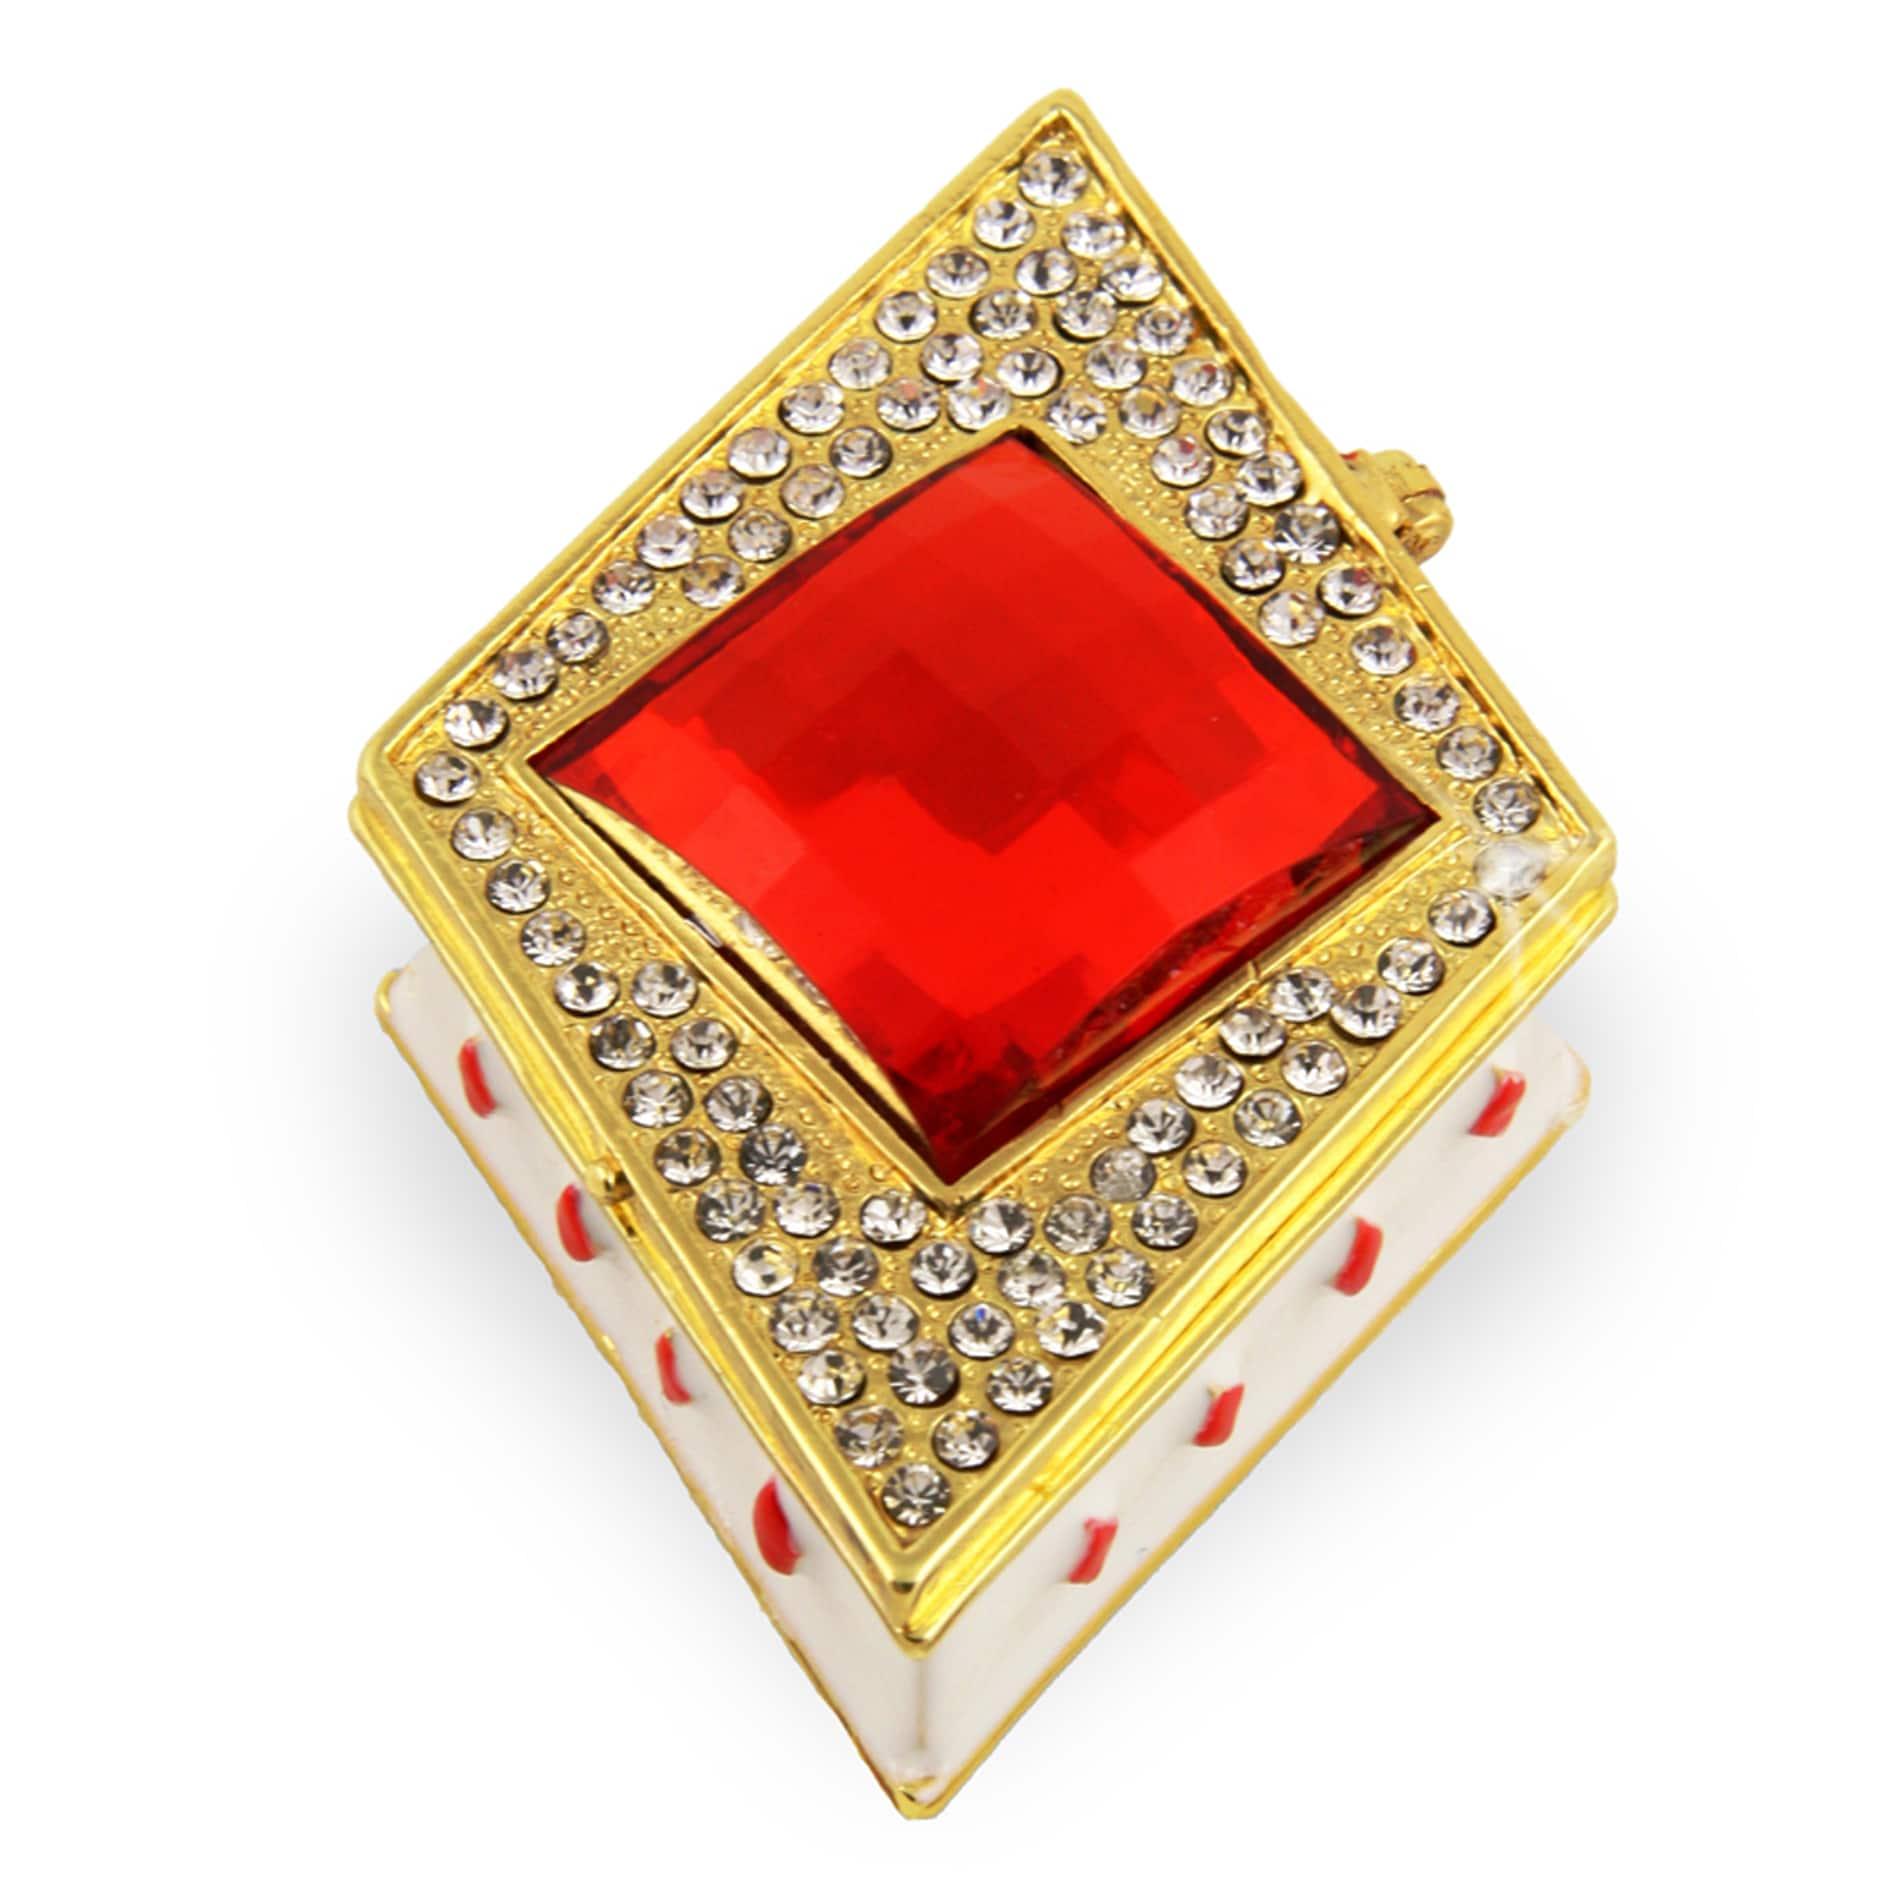 Objet d'art 'Ace of Diamonds' Trinket Box